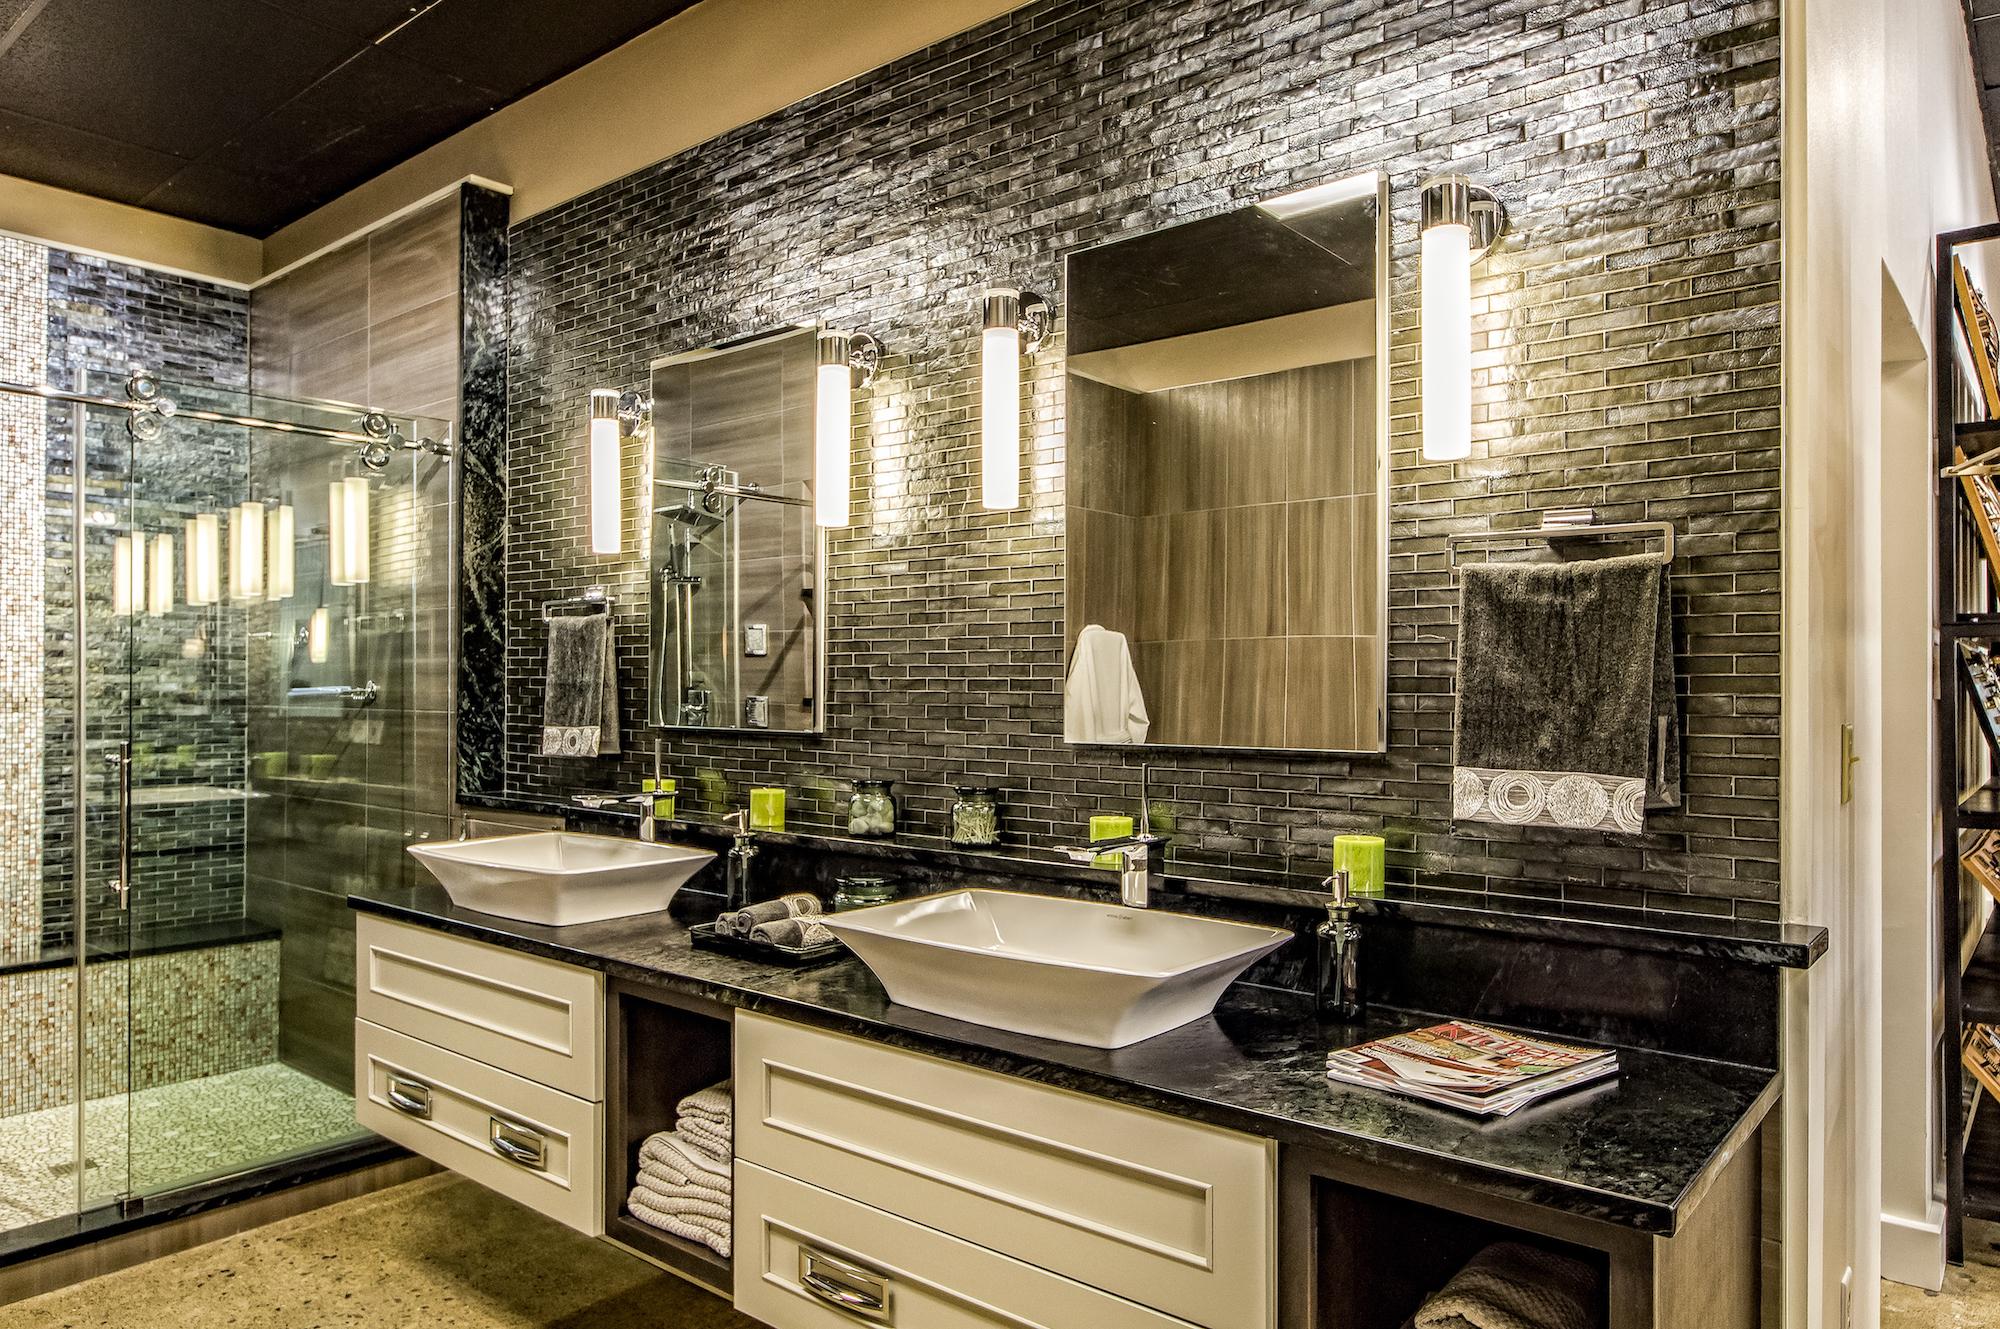 BathRoom Remodeling Showroom, Columbus Ohio, Dream Baths ...